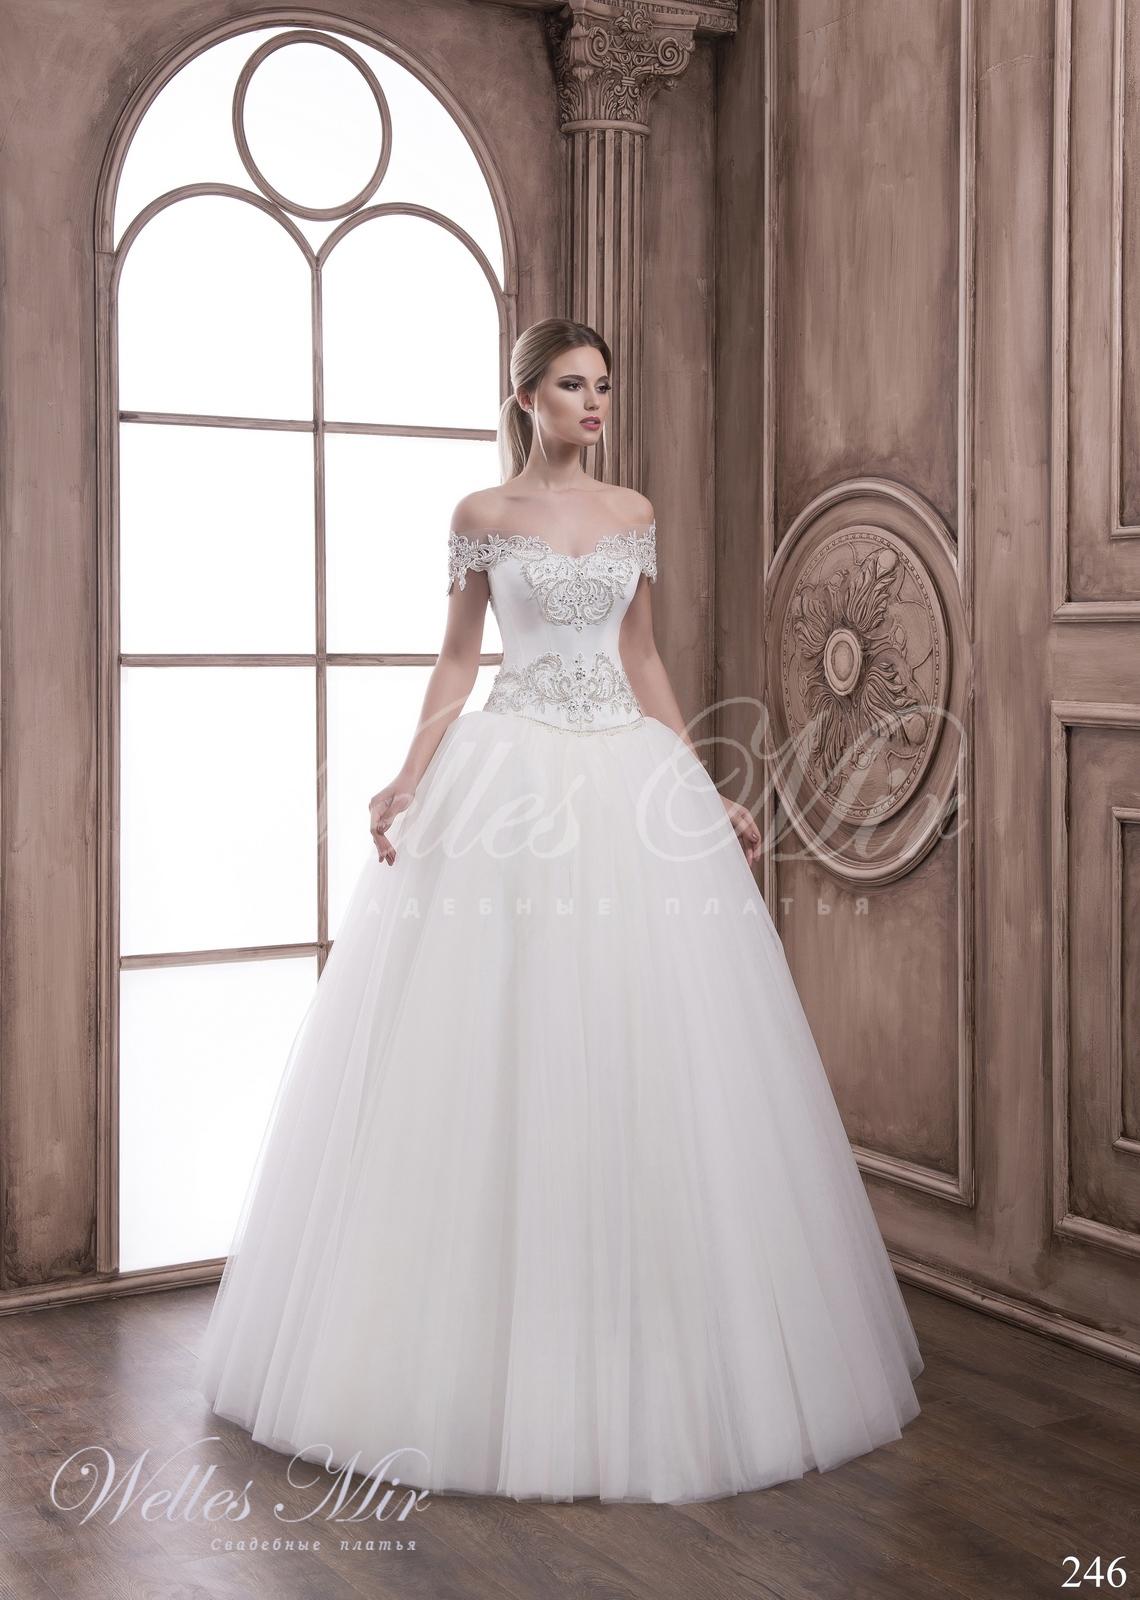 Свадебные платья Tenderness - 246